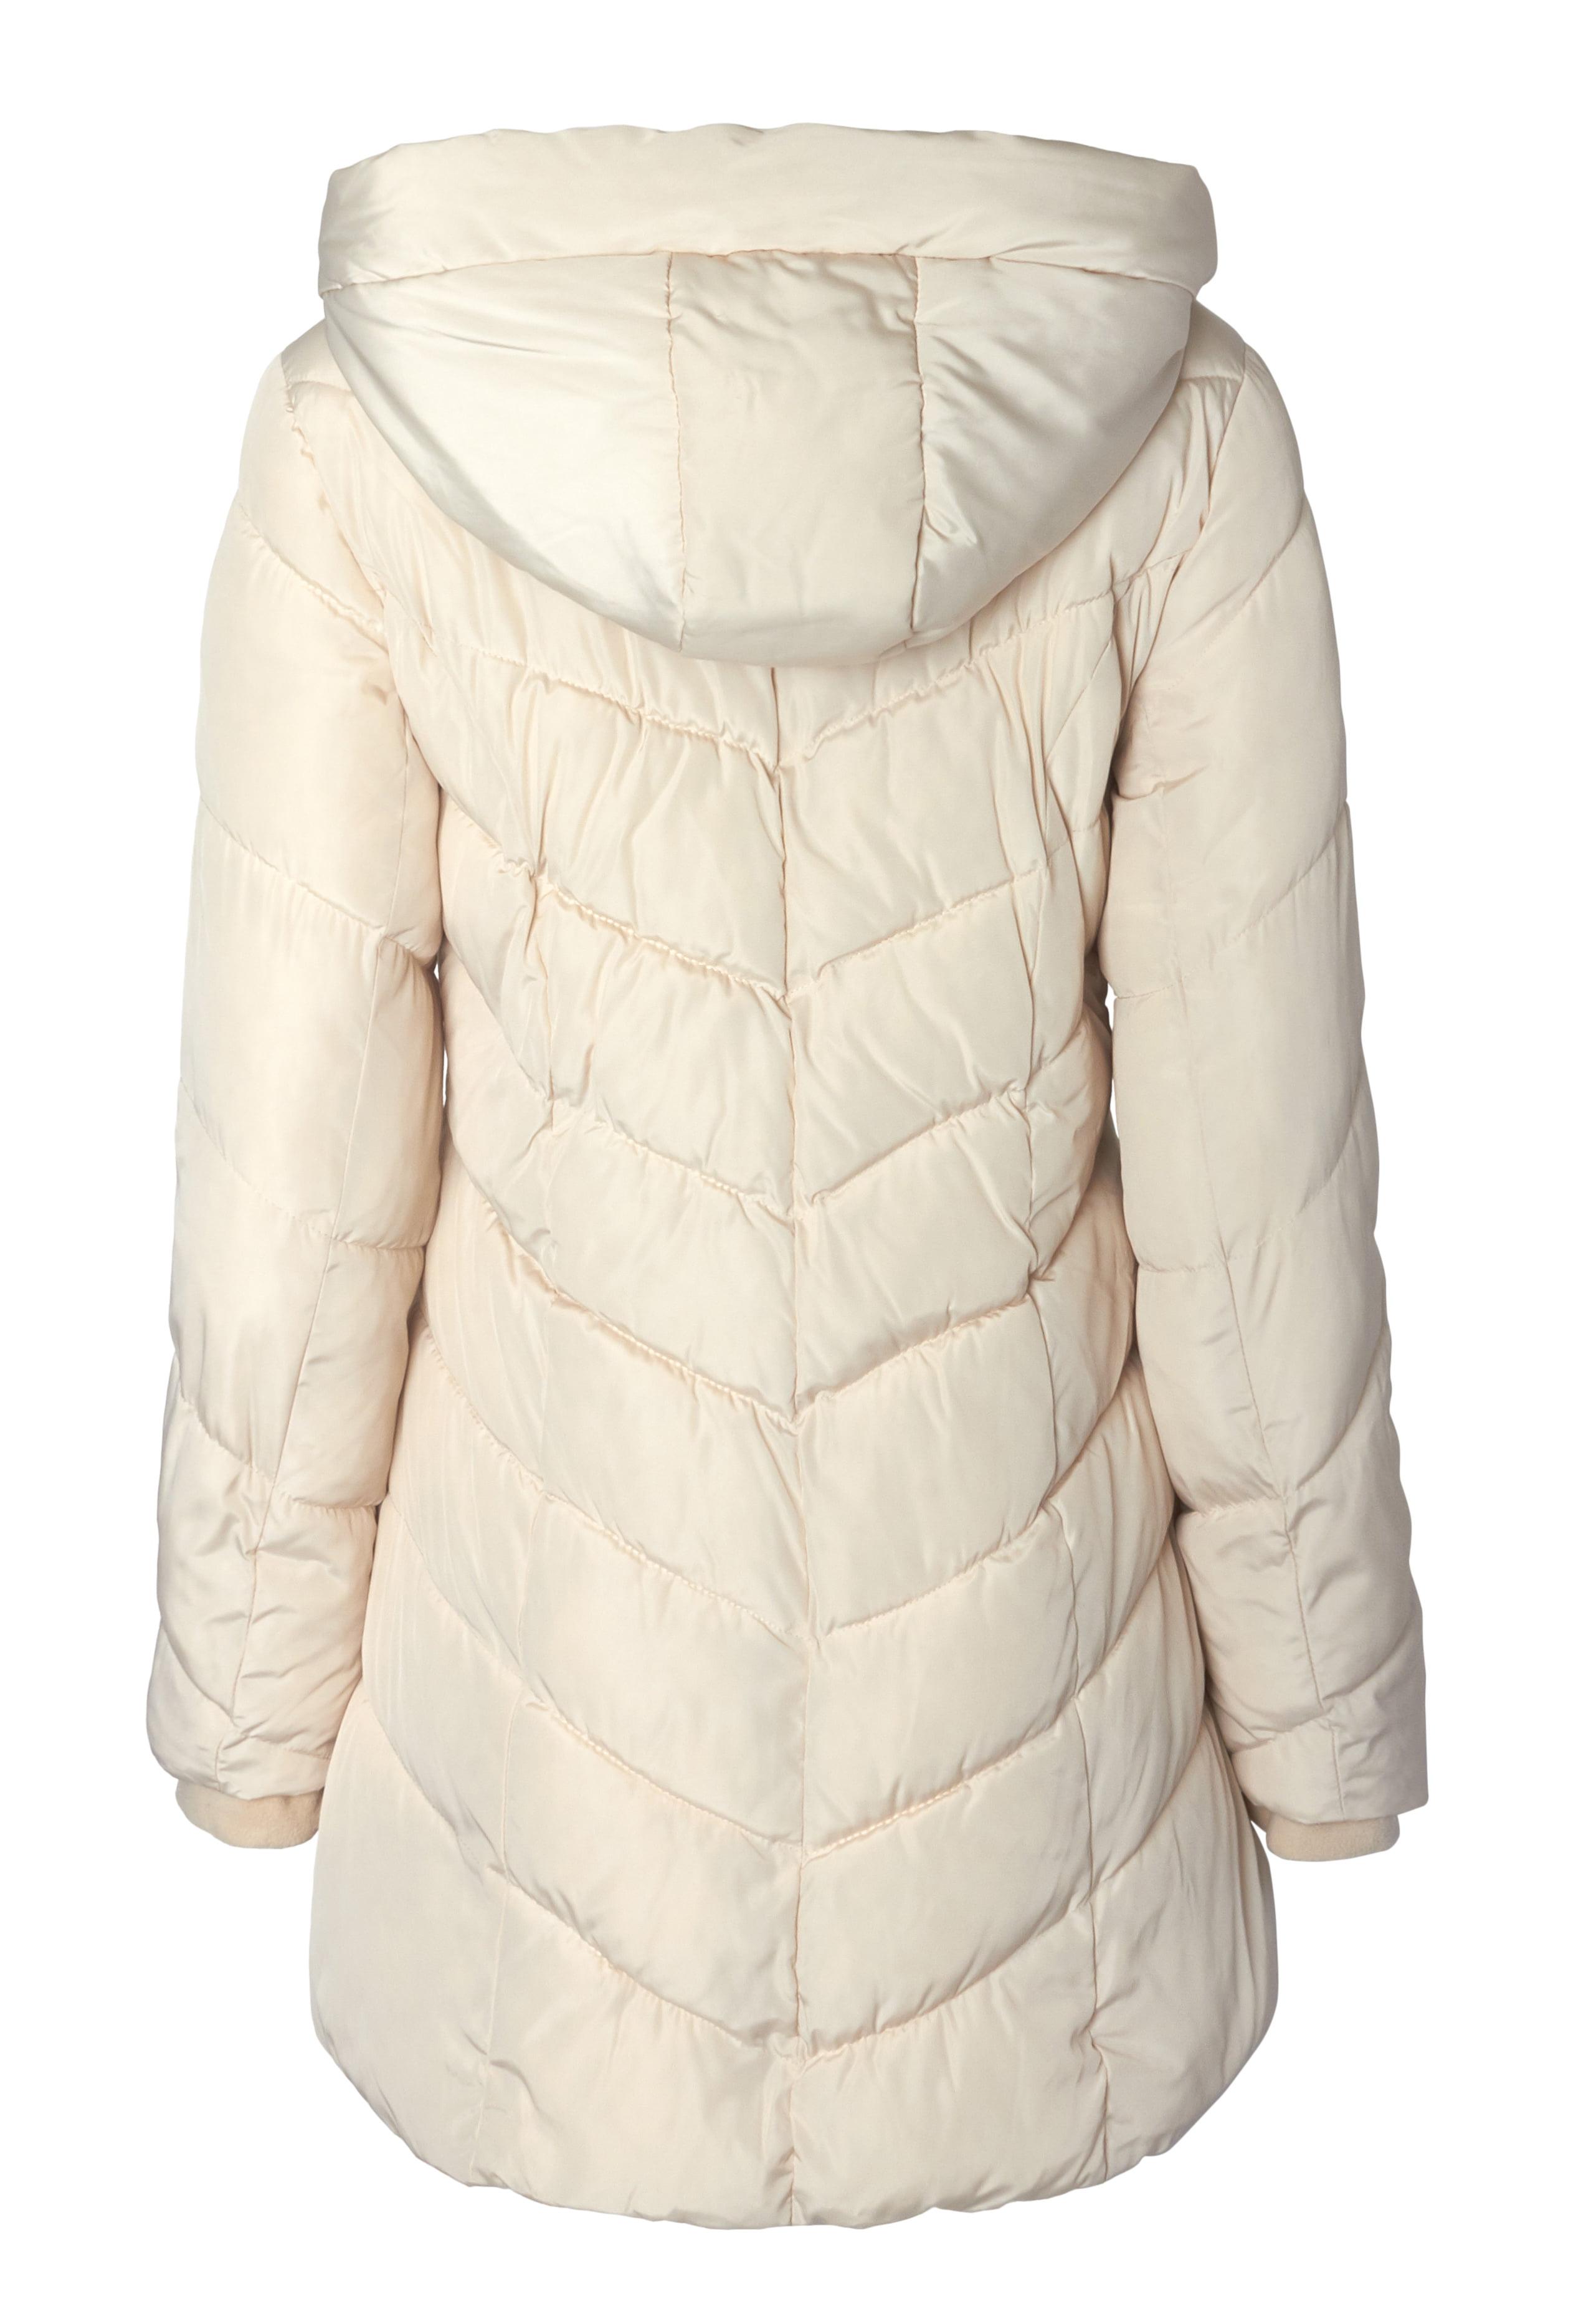 331639bfa65ce Sportoli - Sportoli Womens Winter Fleece Lined Chevron Quilted Puffer  Jacket Coat with Hood - Ivory (Size 3X ) - Walmart.com